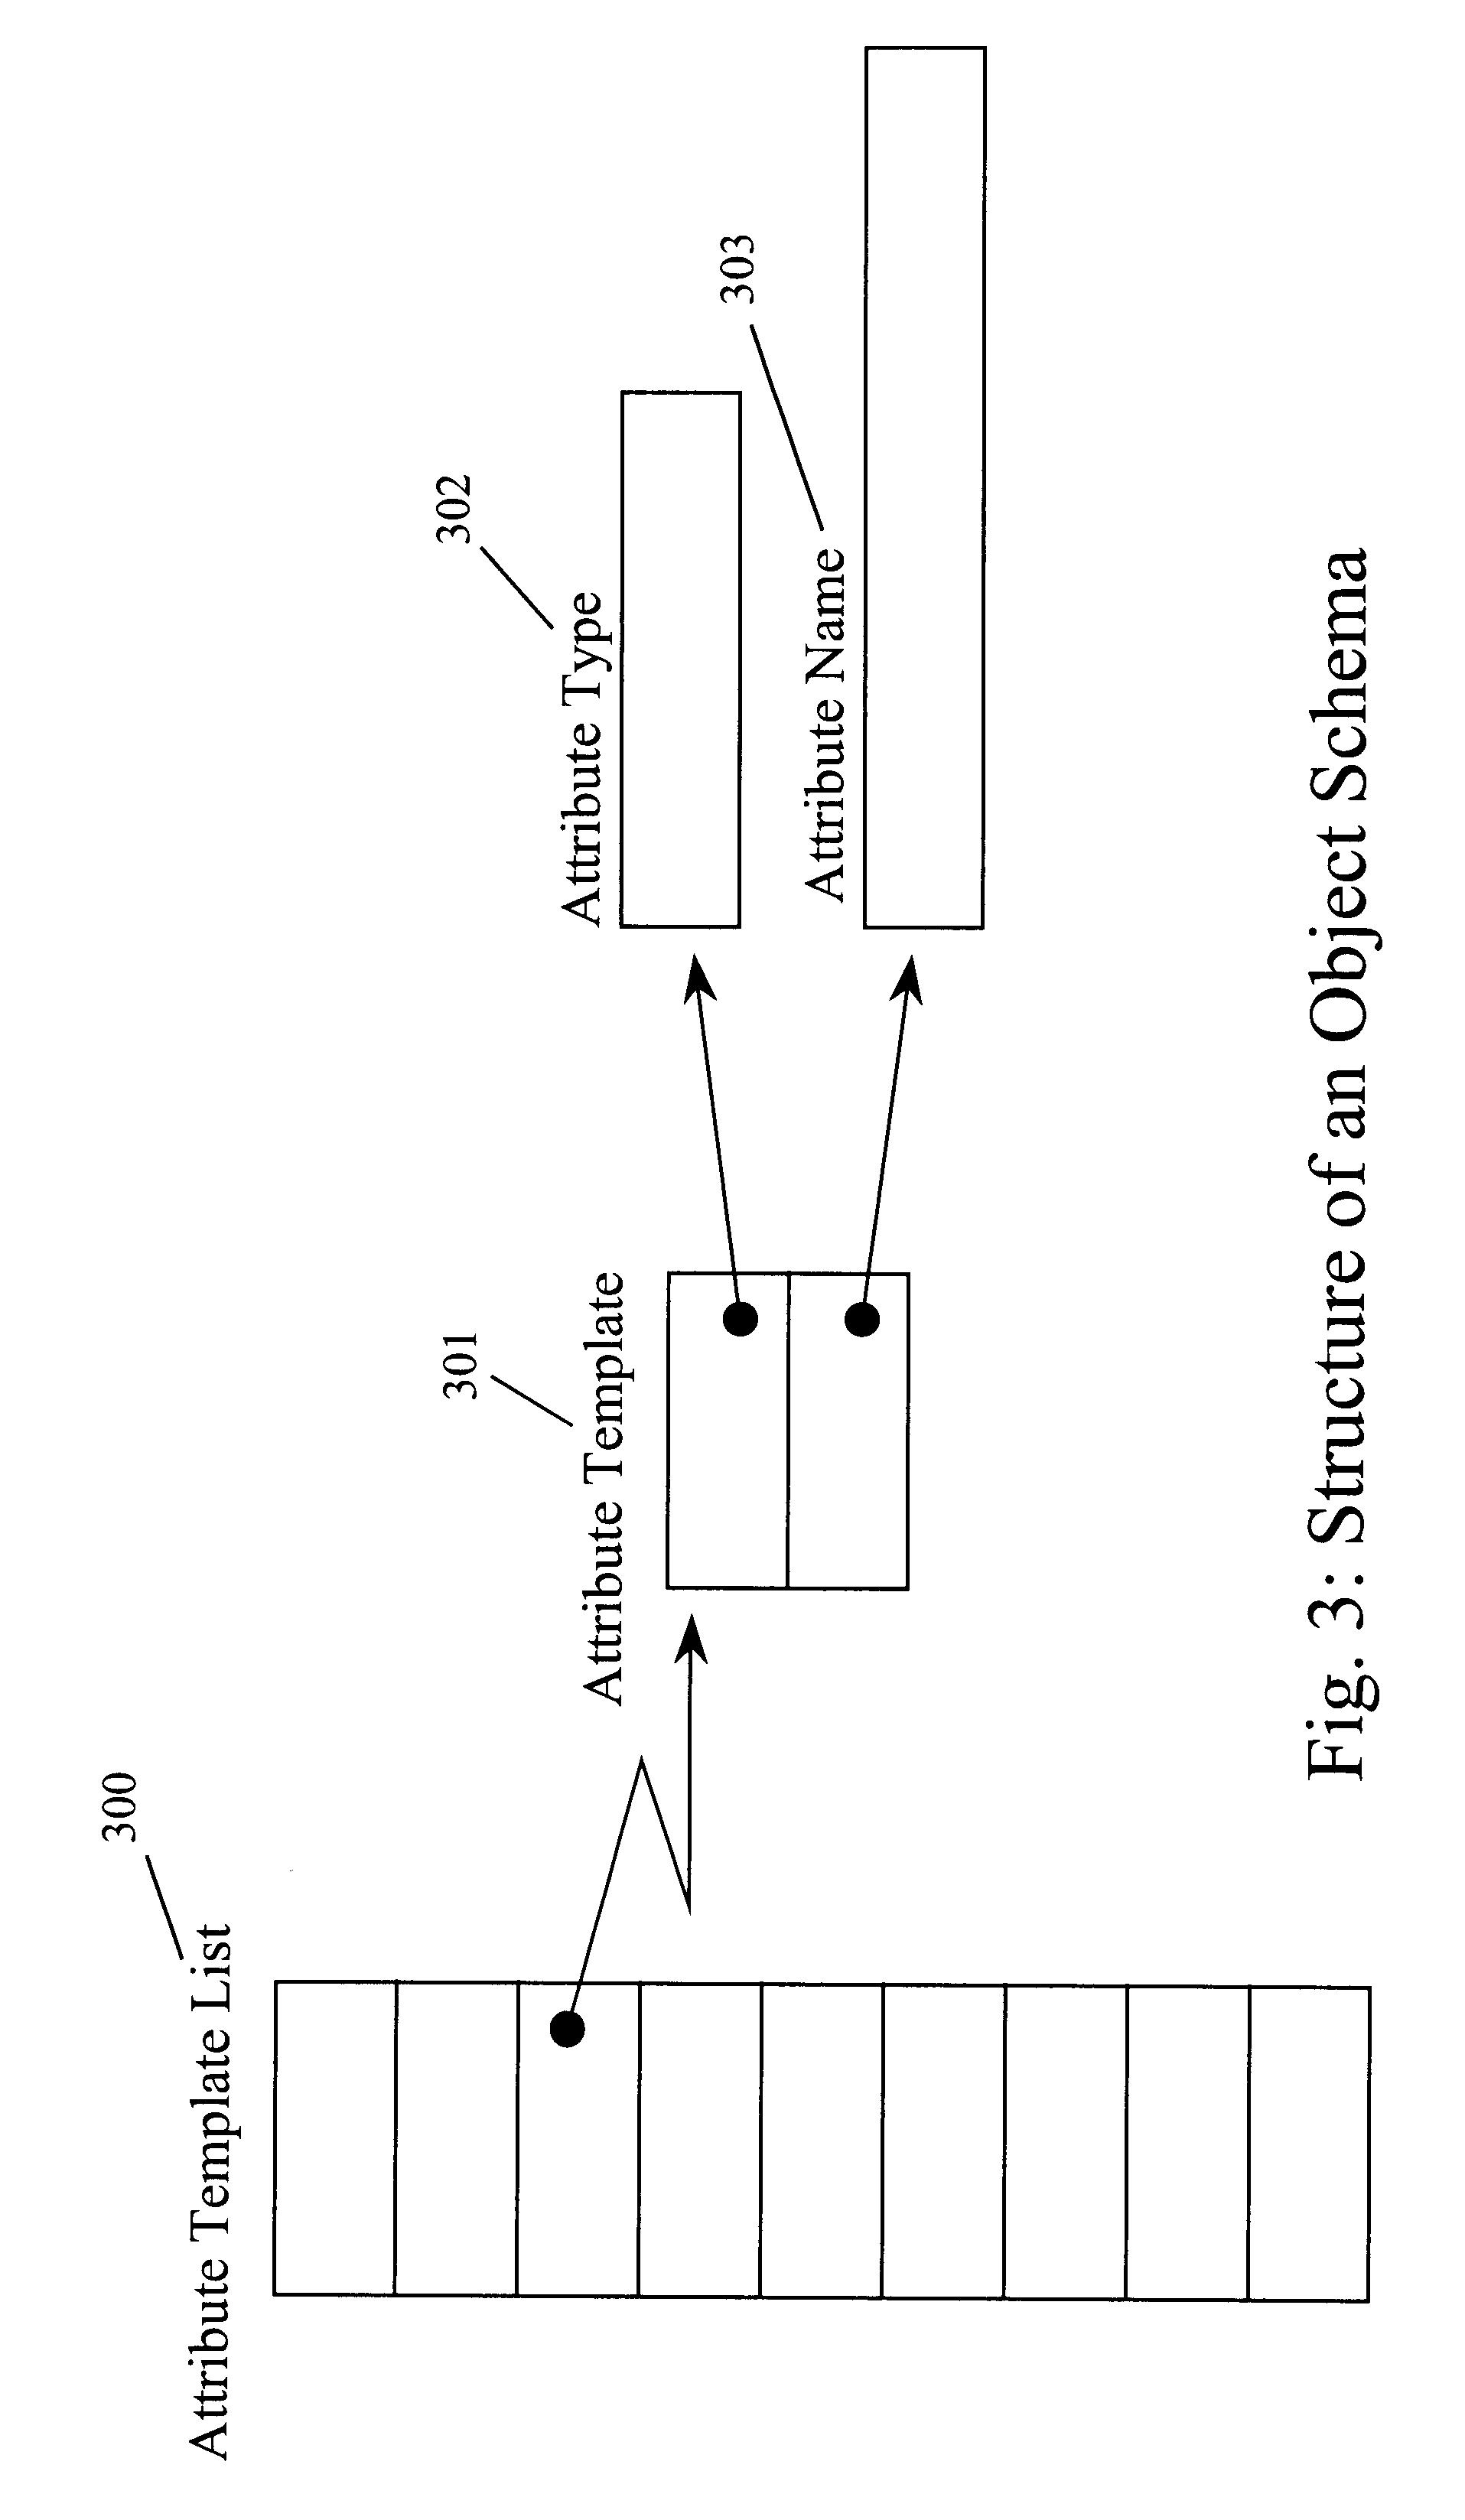 Patent Us 6728713 B1 Small Tv Transmitter Diagram